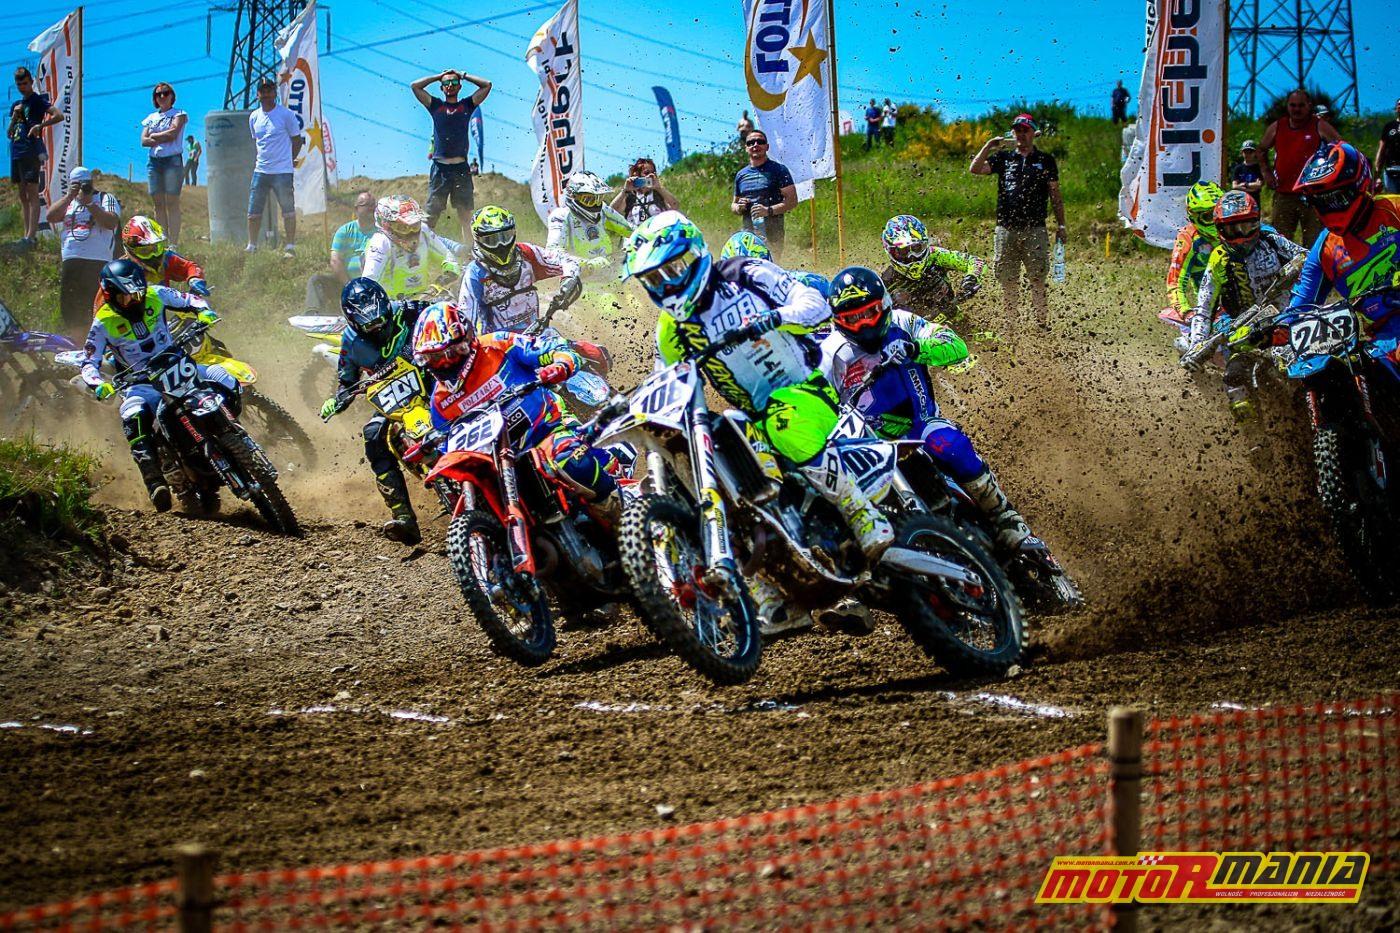 ORLEN MXMP Gdansk 2017 (6)